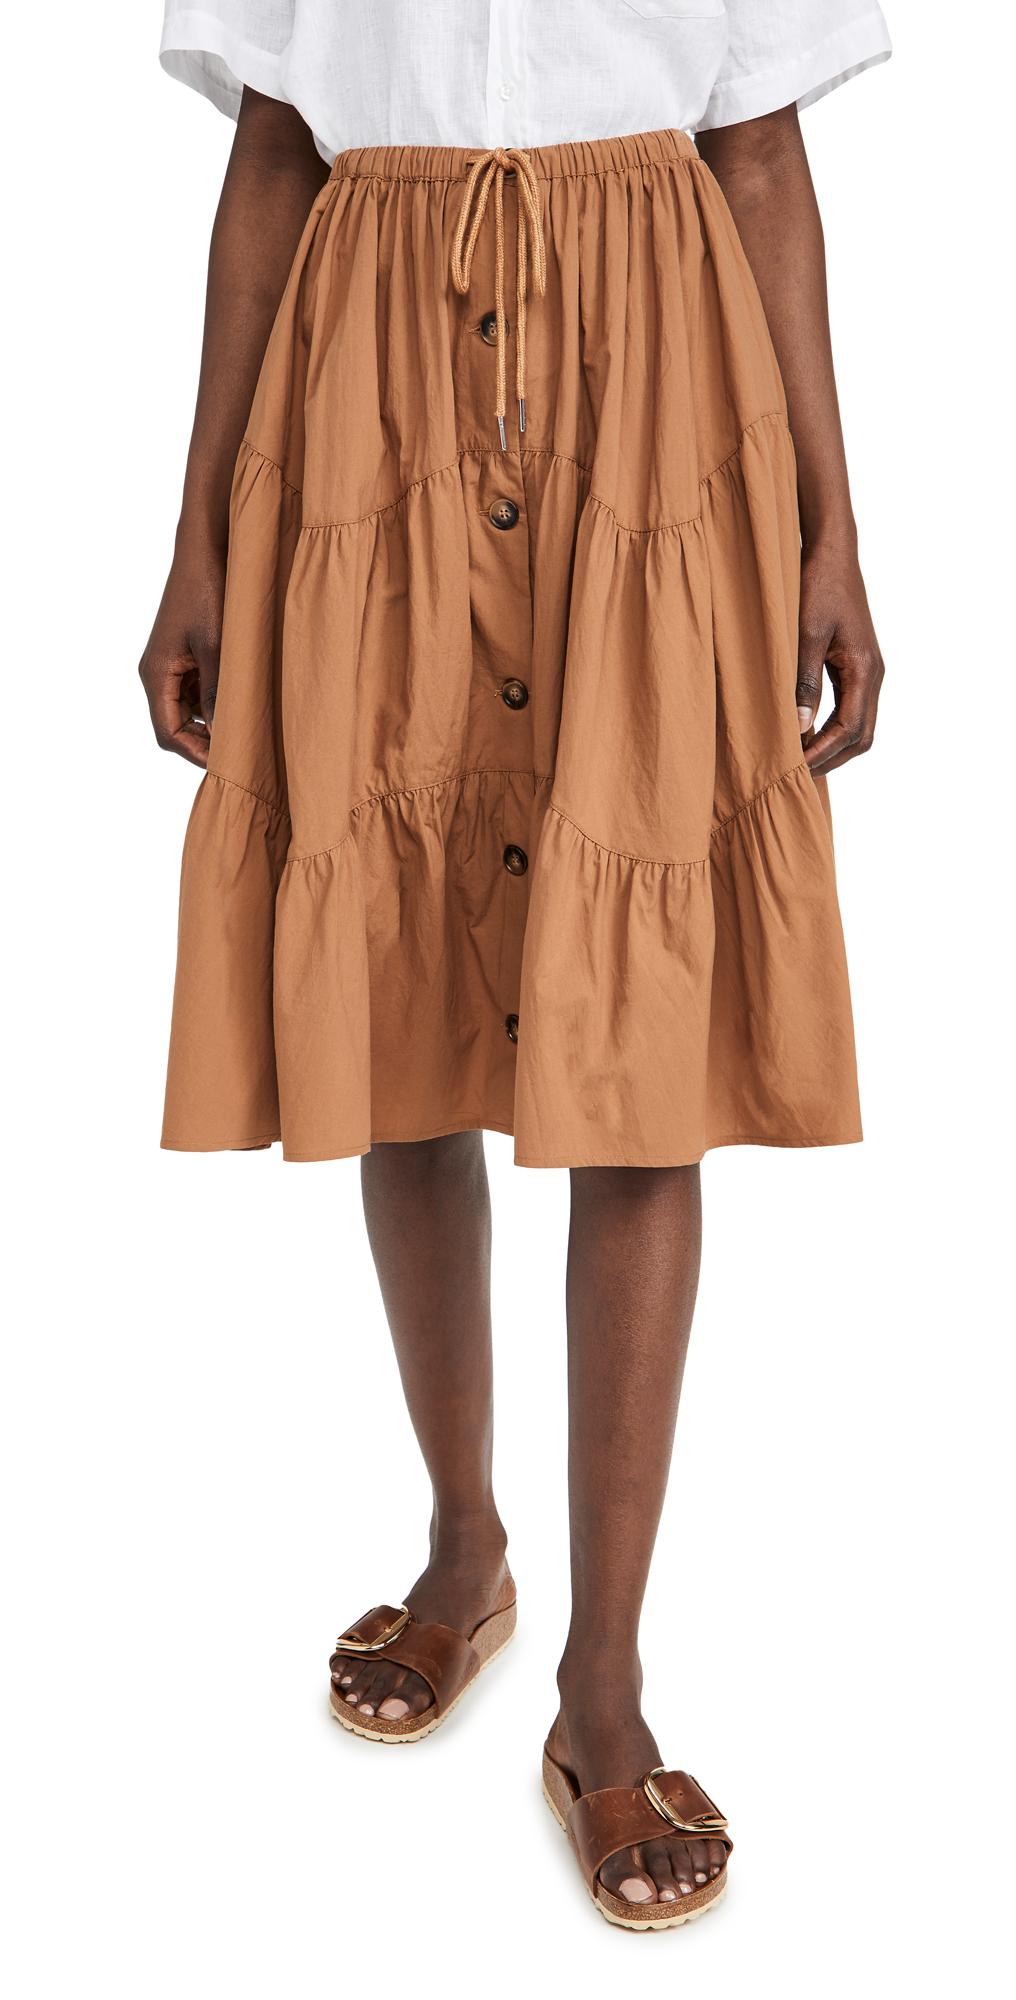 Meadows Thyme Skirt